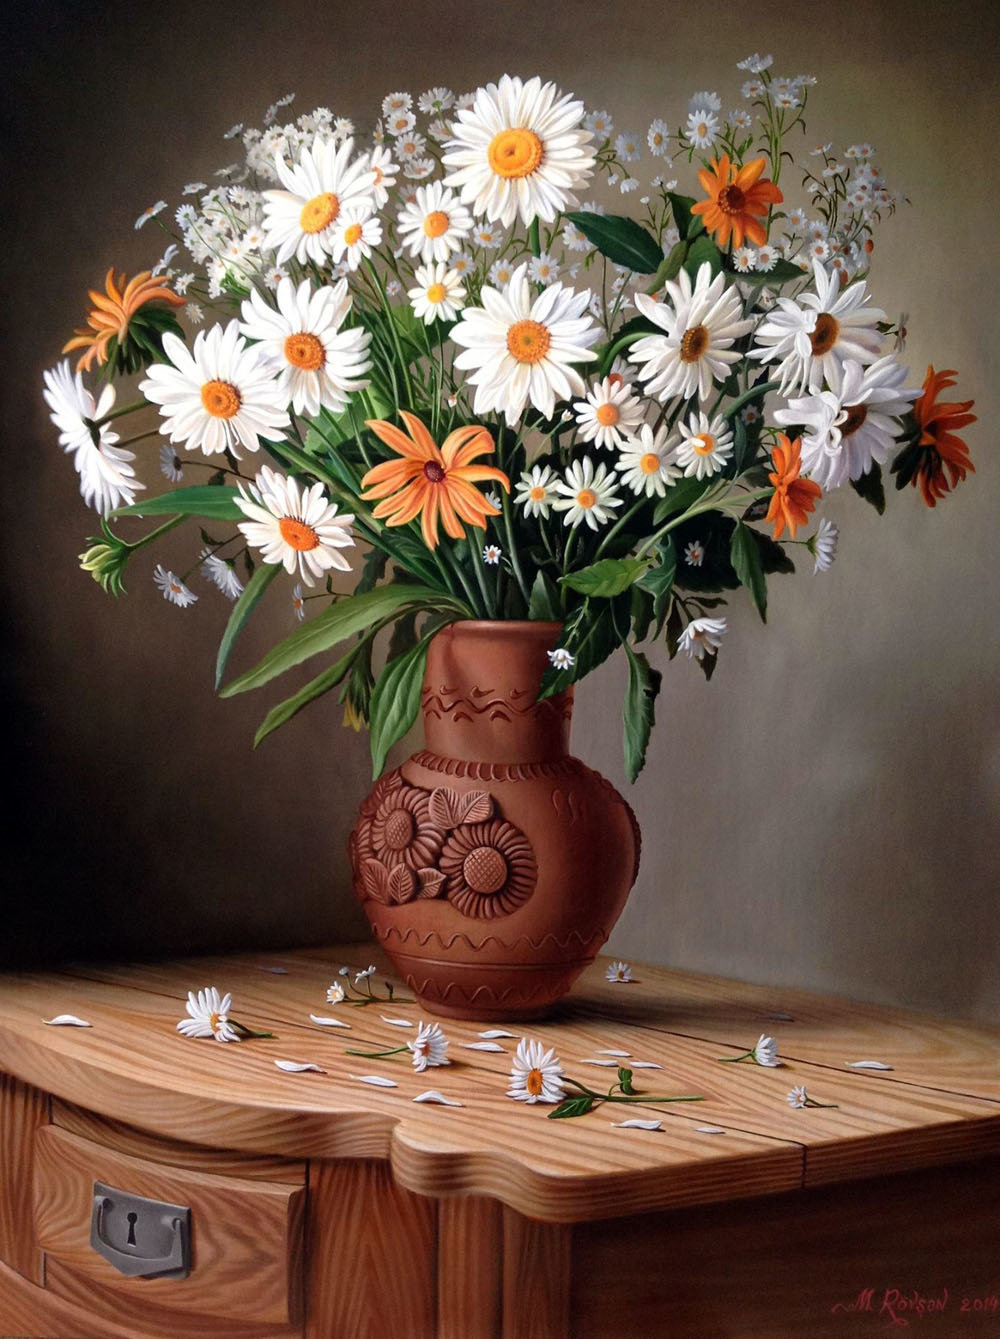 вероятно, картинки с цветами ромашки в вазе лотяну